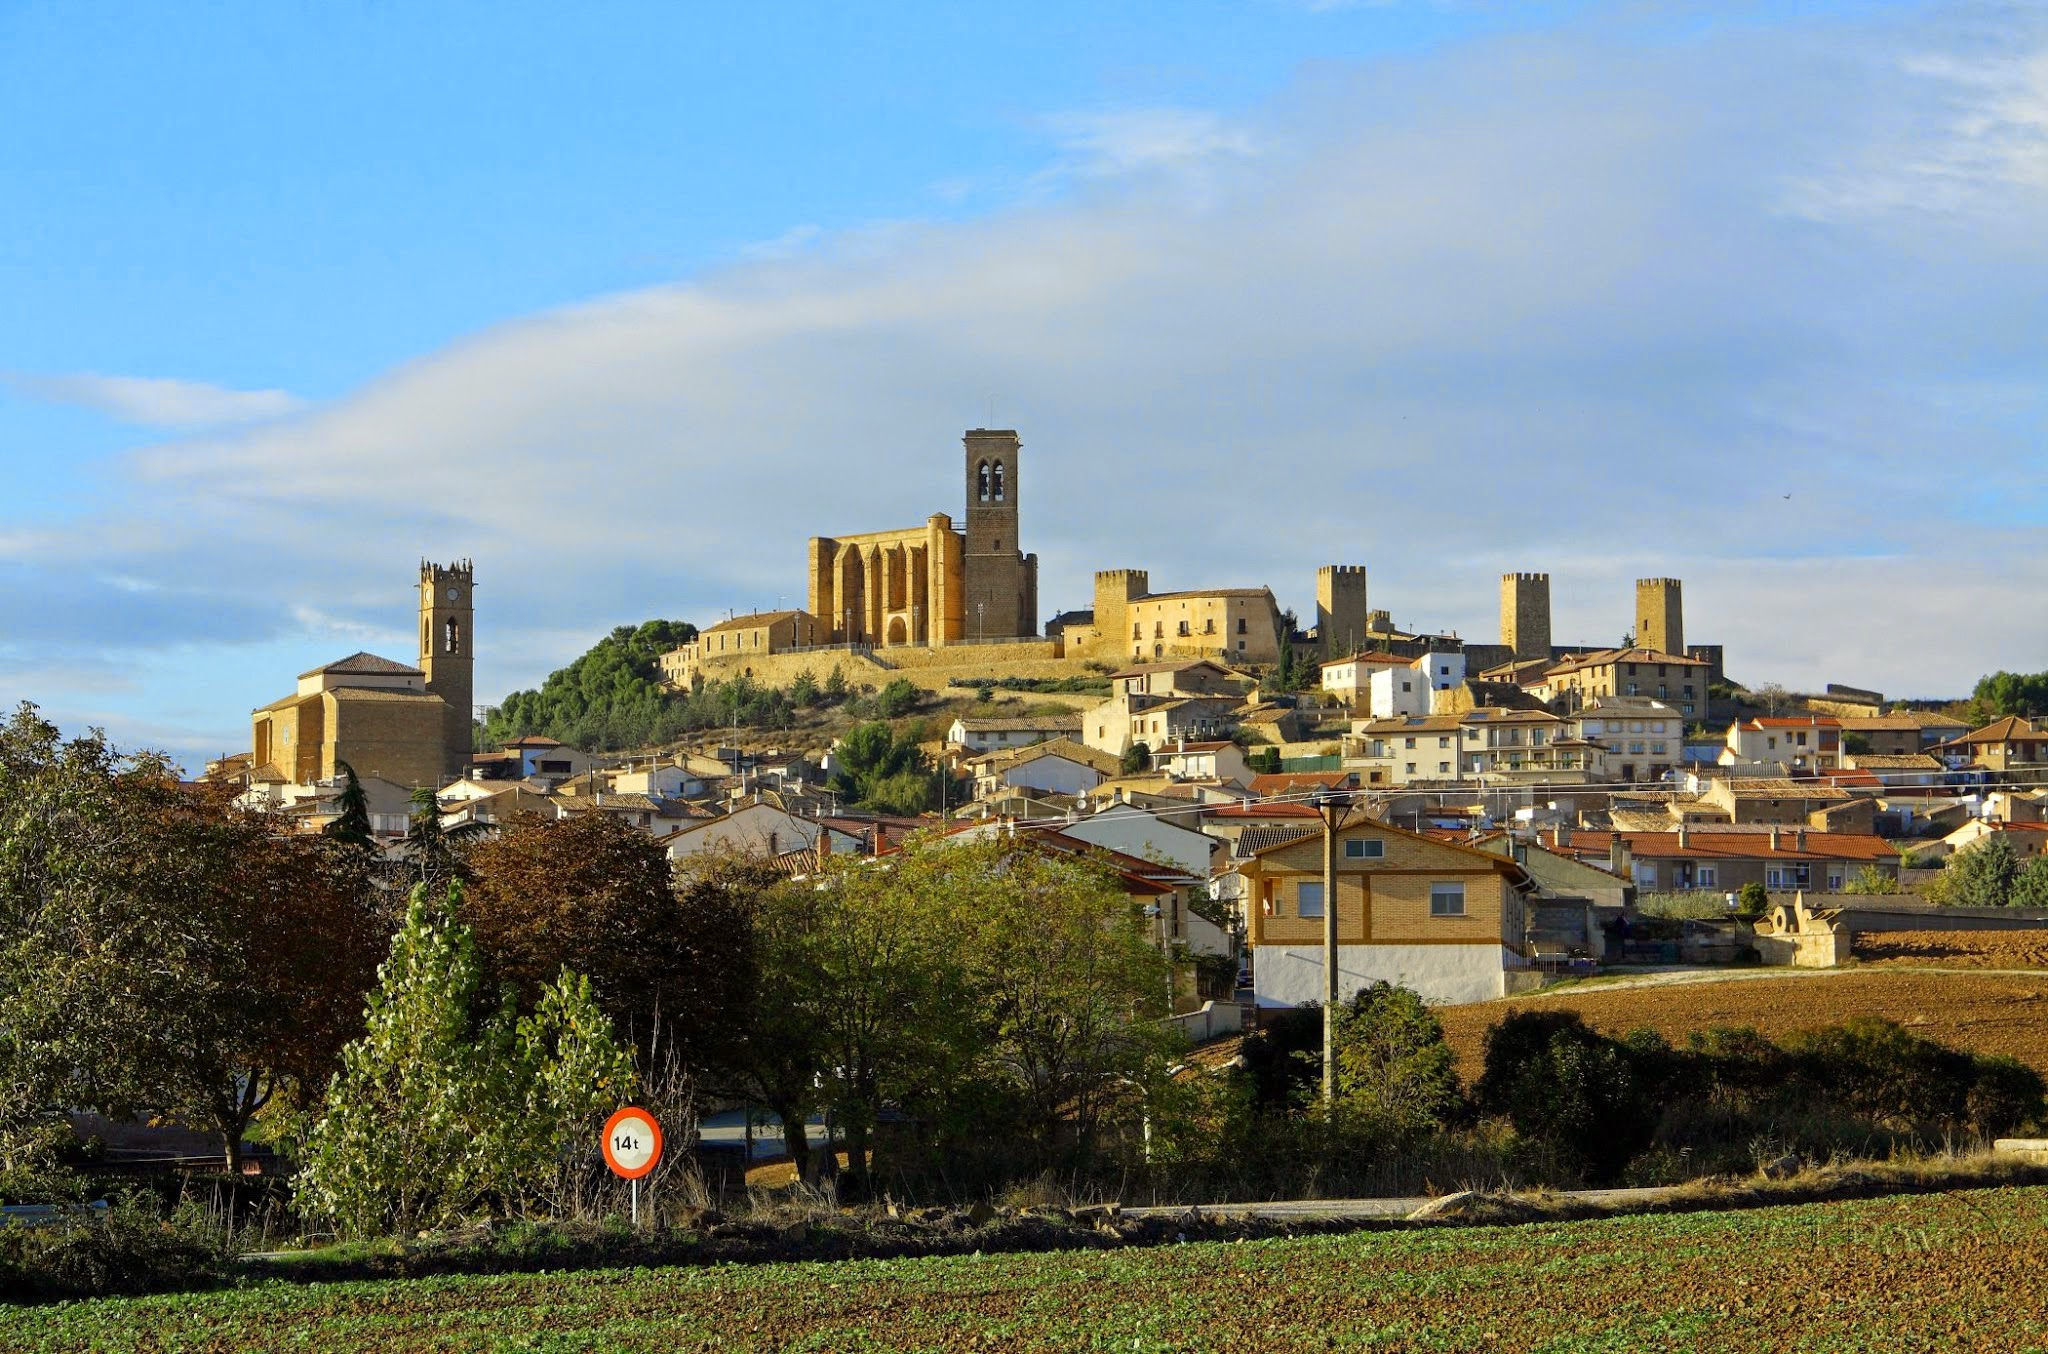 Vista general de Artajona, Navarra